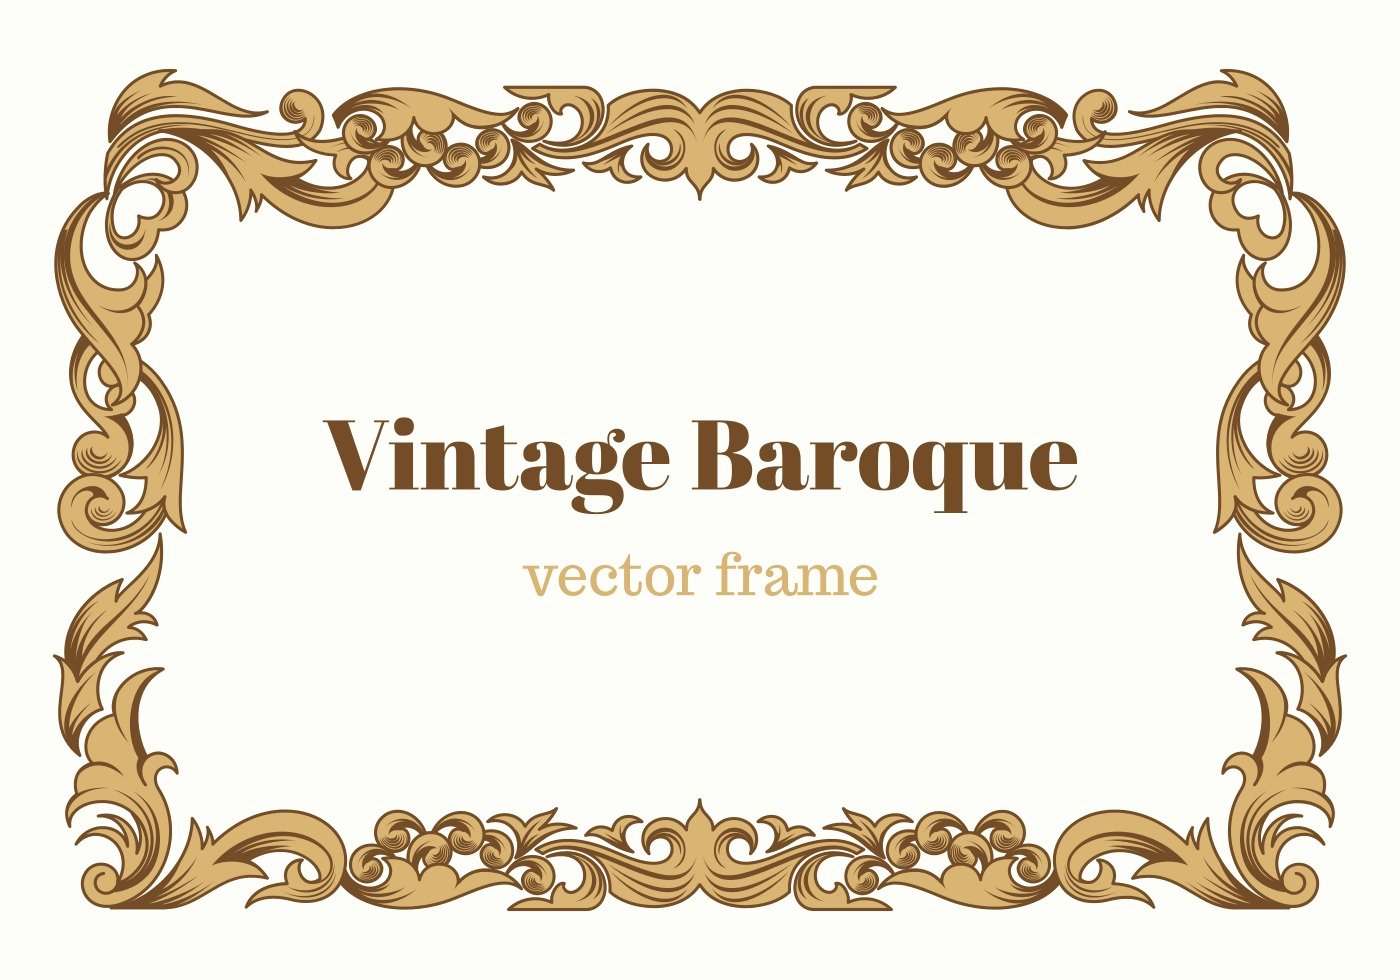 free vintage baroque vector frame